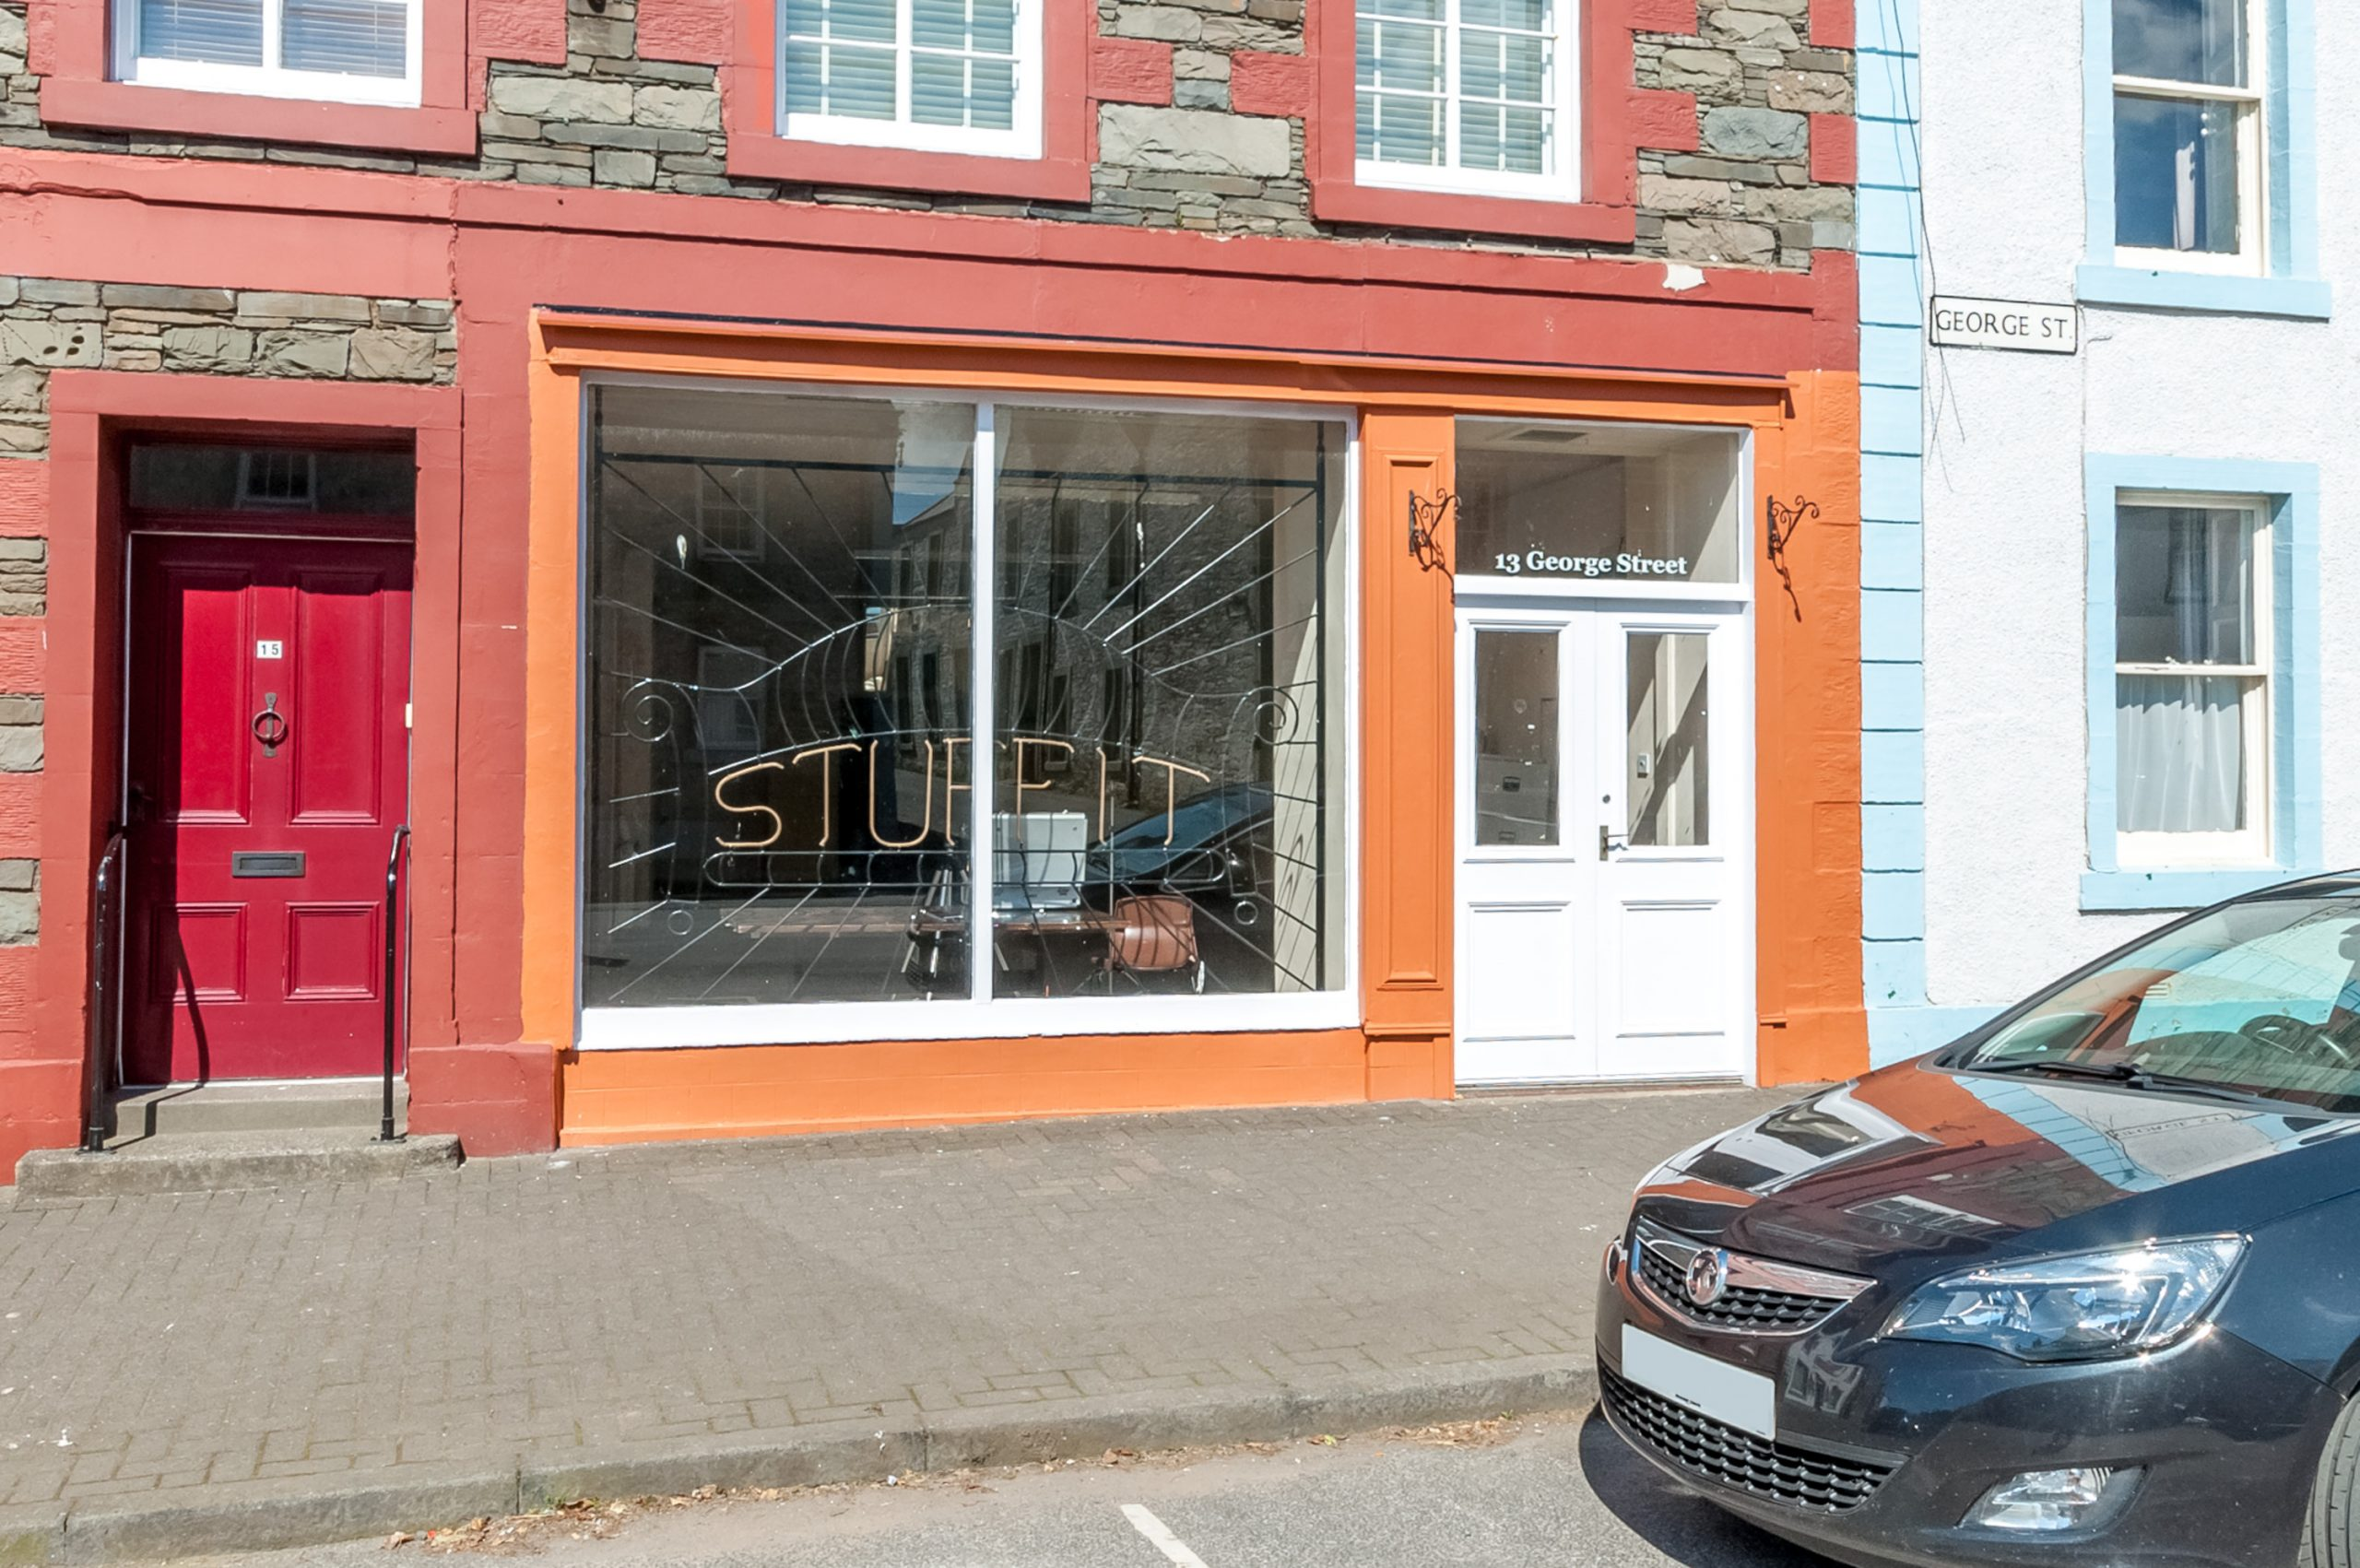 Shop Premises, 13 George Street, Whithorn, DG8 8NS